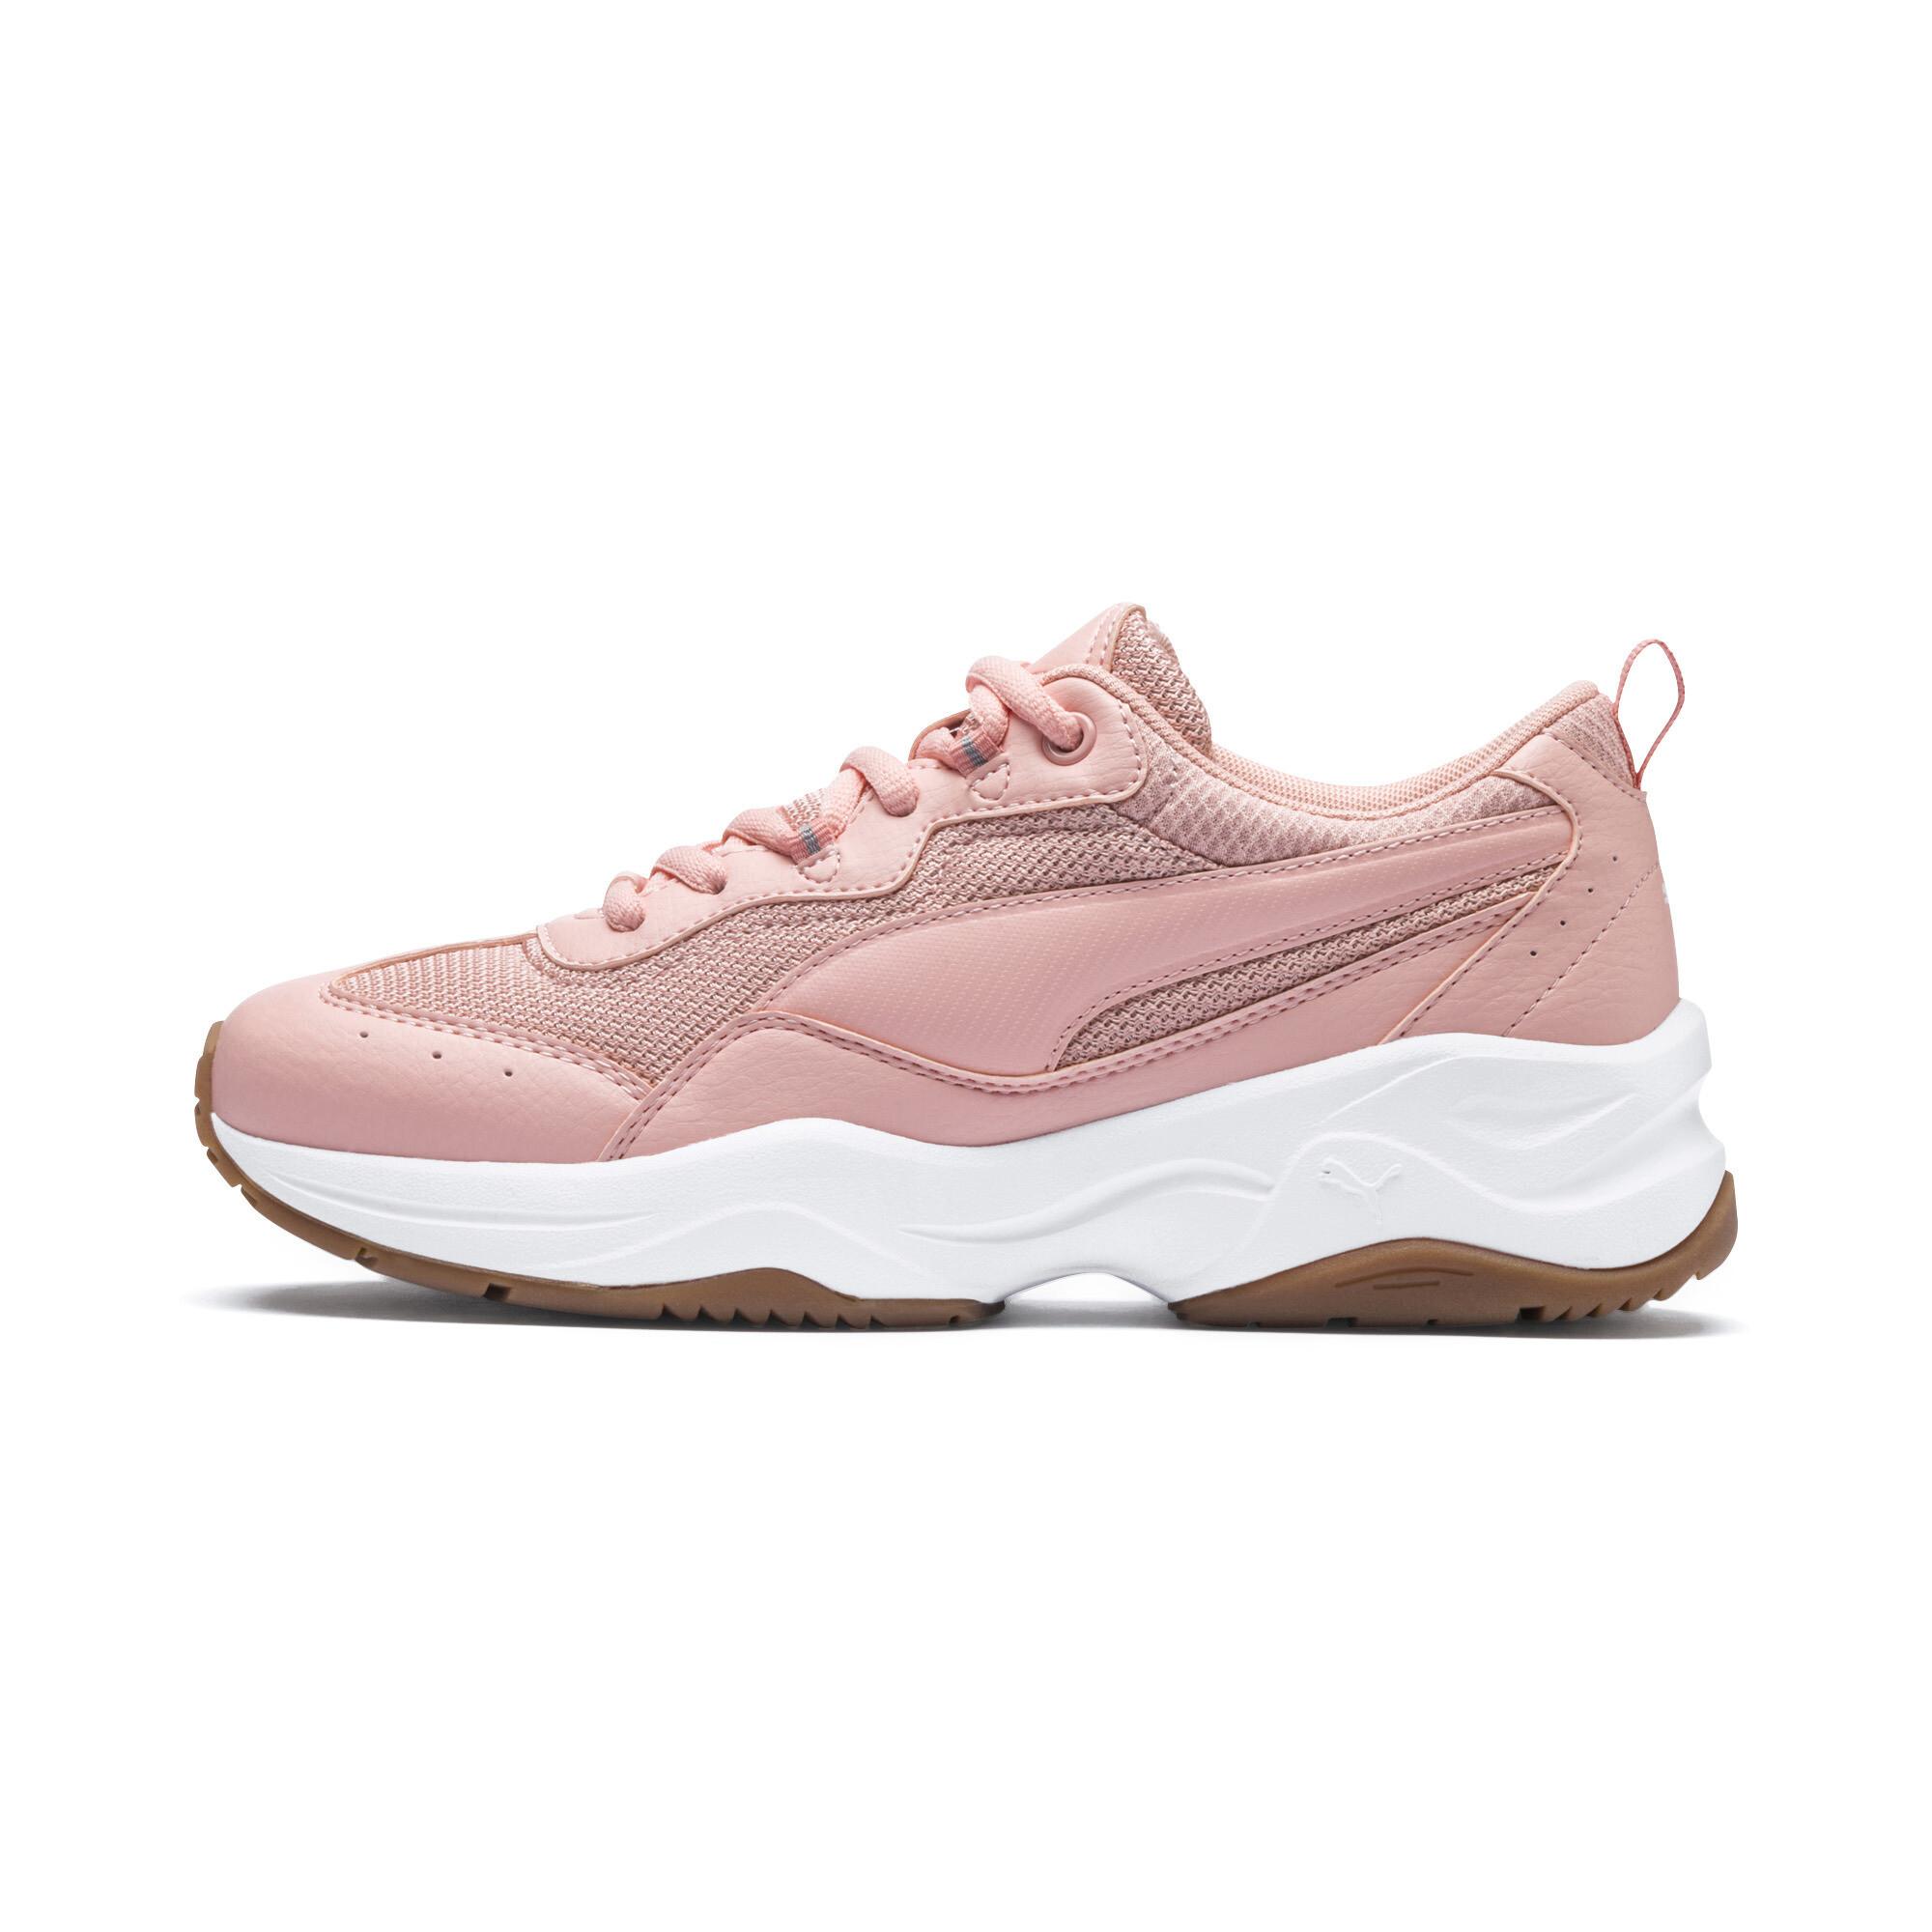 PUMA-Cilia-Women-039-s-Sneakers-Women-Shoe-Basics thumbnail 4